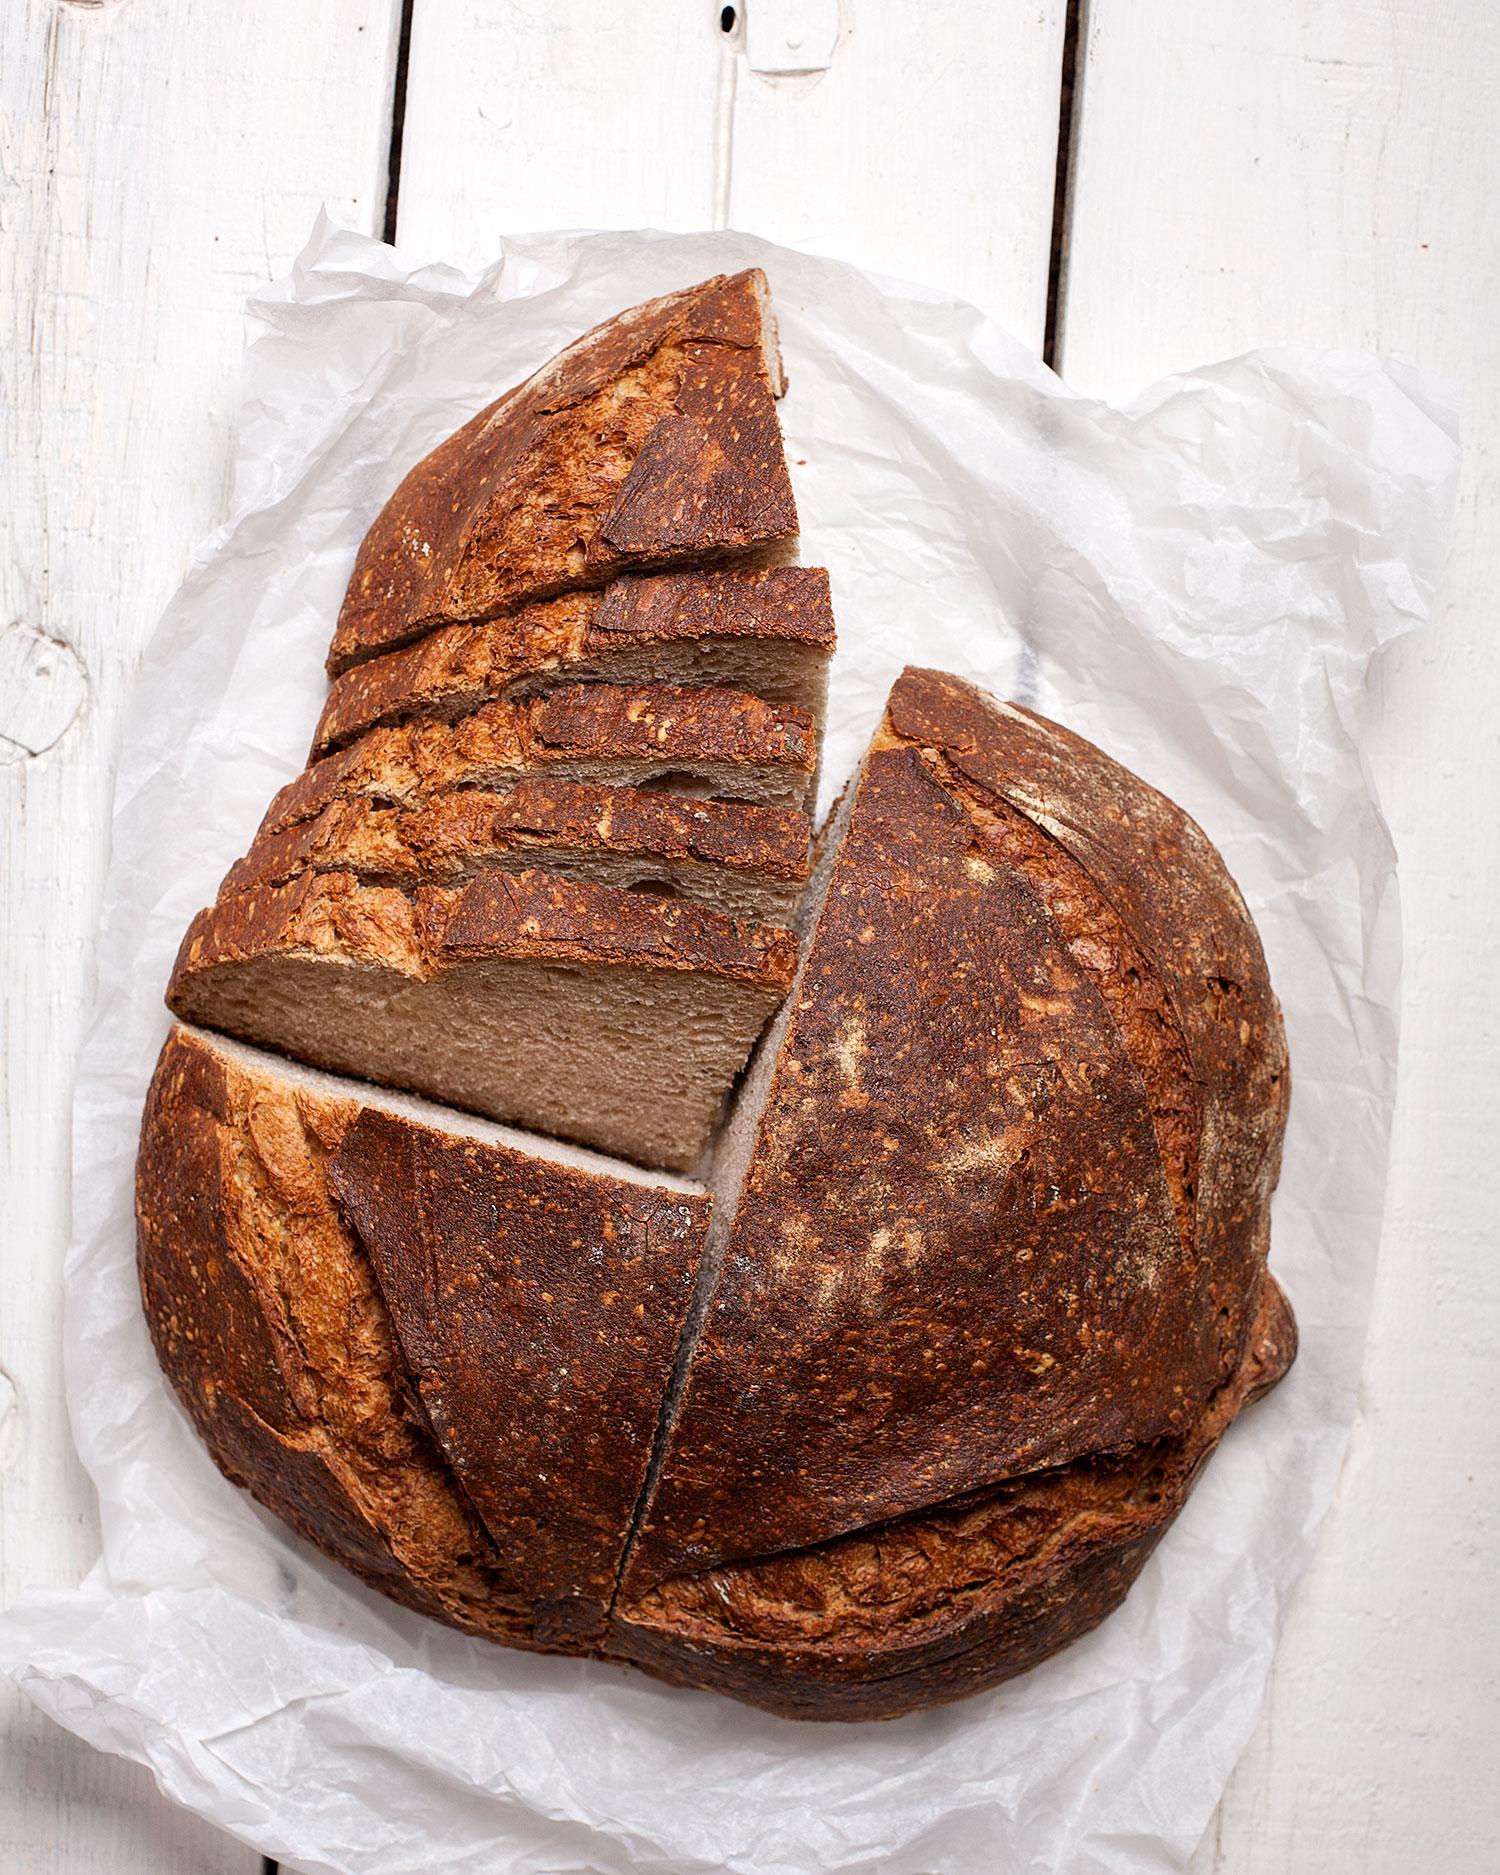 corina-landa-food-photography-fotografia-gastronomica-51.jpg